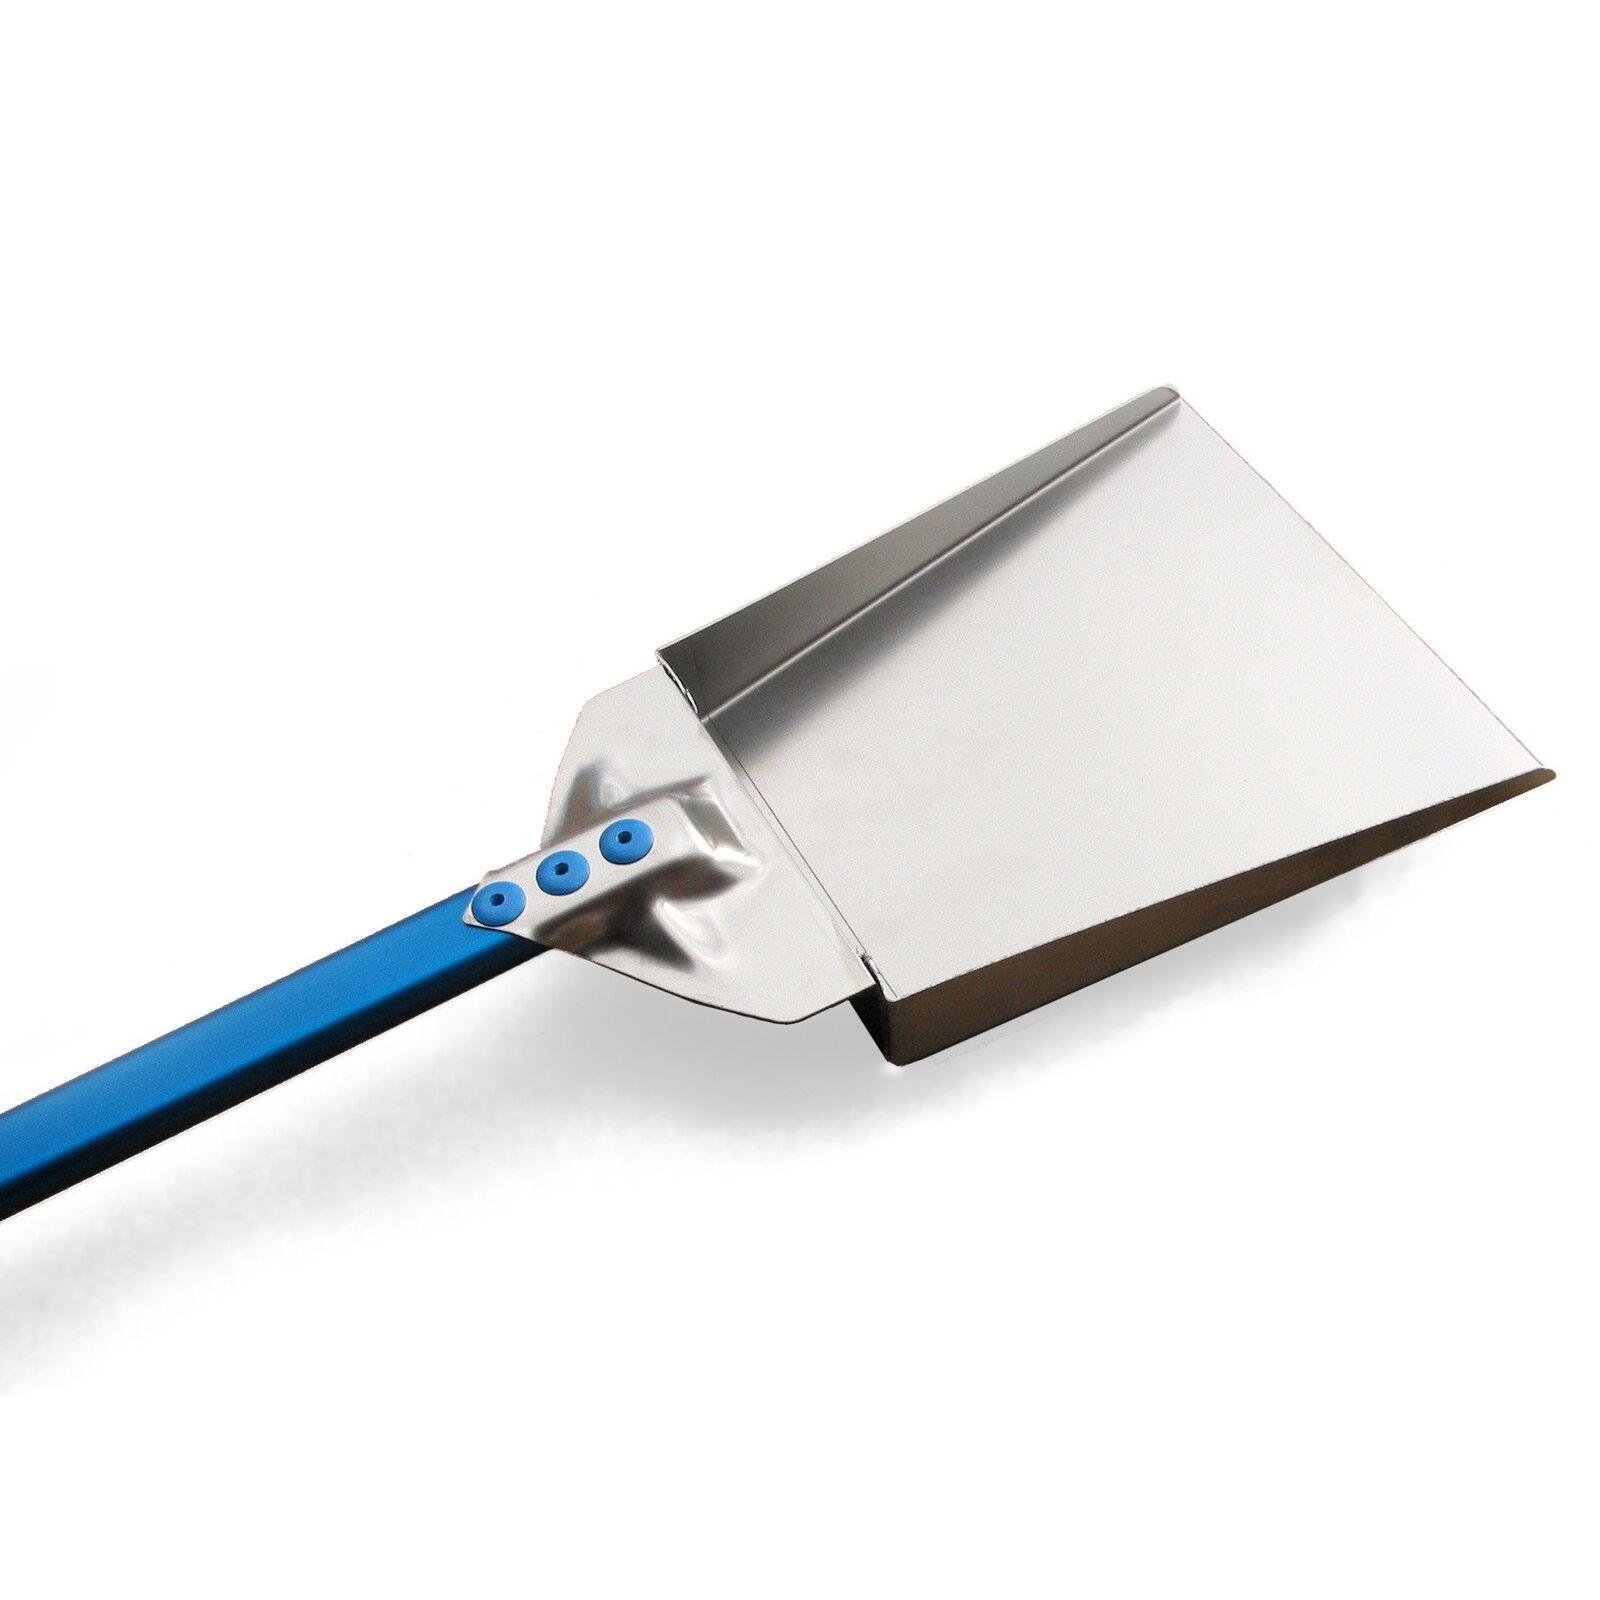 GI.METAL Stainless Steel Ash Shovel - Made in